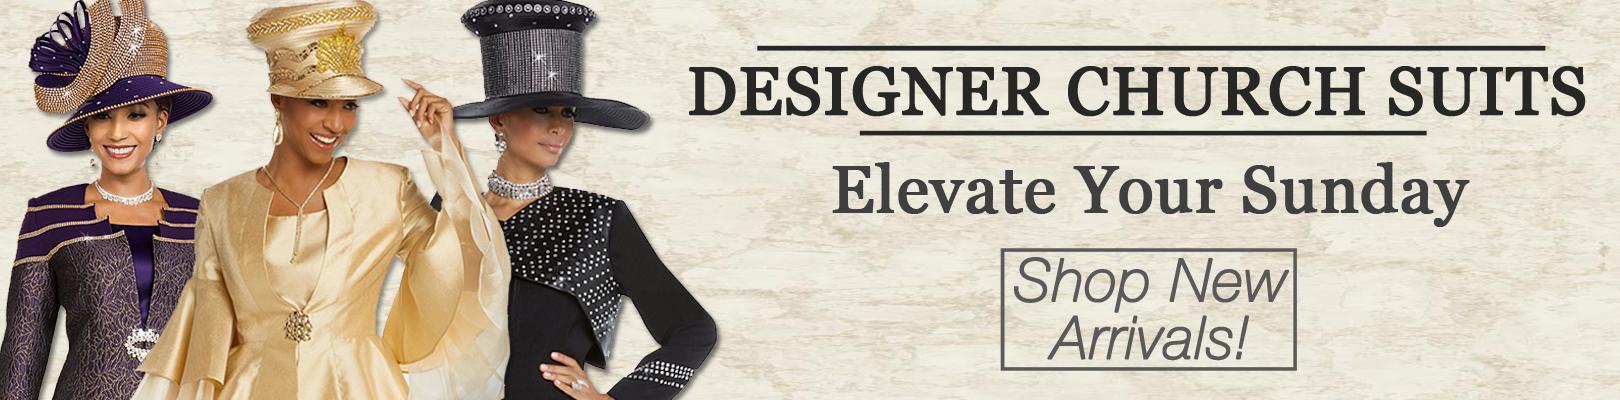 Church Suits, Church Suits For Women - Designer Church Suits